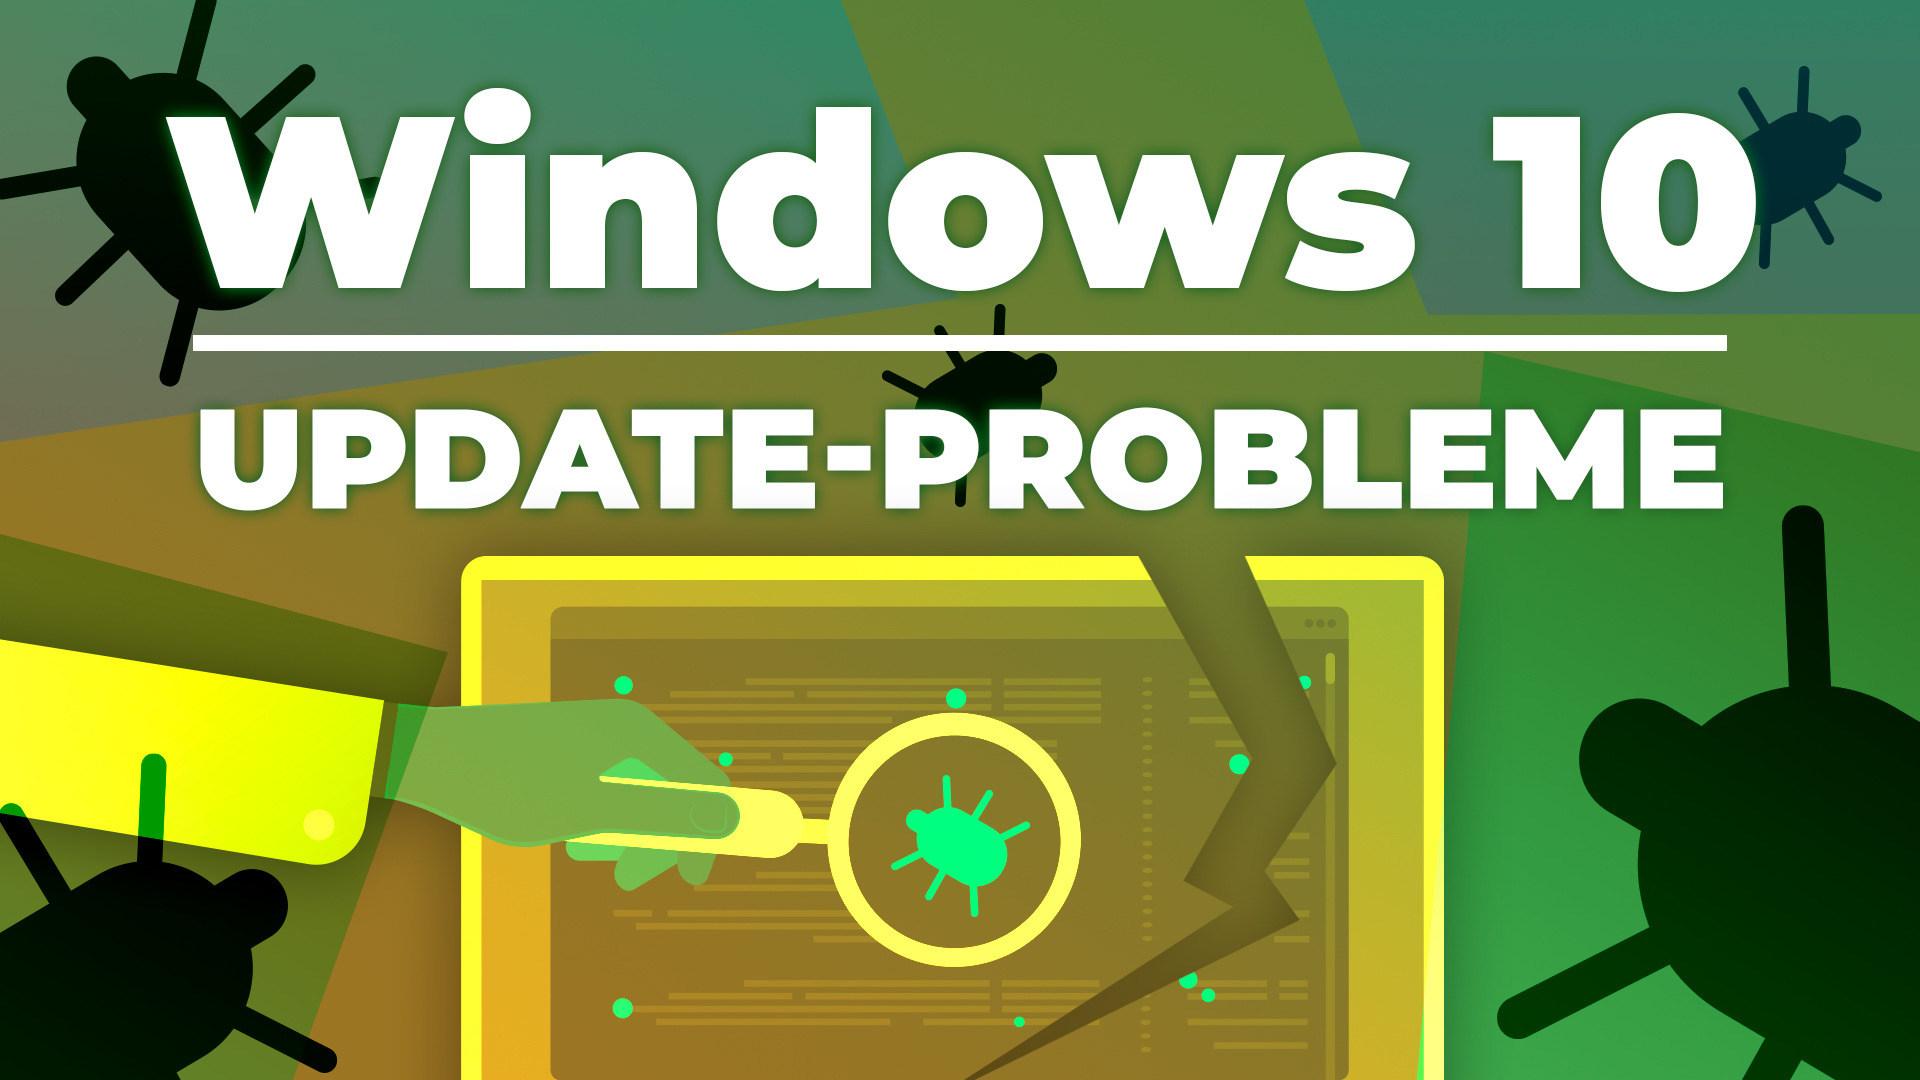 Microsoft, Betriebssystem, Windows 10, Update, Fehler, Bug, Windows Update, Fehlerbehebung, Windows 10 Update, Windows 10 bugs, Windows 10 Bug, Windows 10 Fehler, Update Fehler, Bugs bugs bugs, Windows 10 Bugfix, Update-Probleme, Windows 10 Update Fehler, Windows Update Fehler, Windows Fehlermeldung